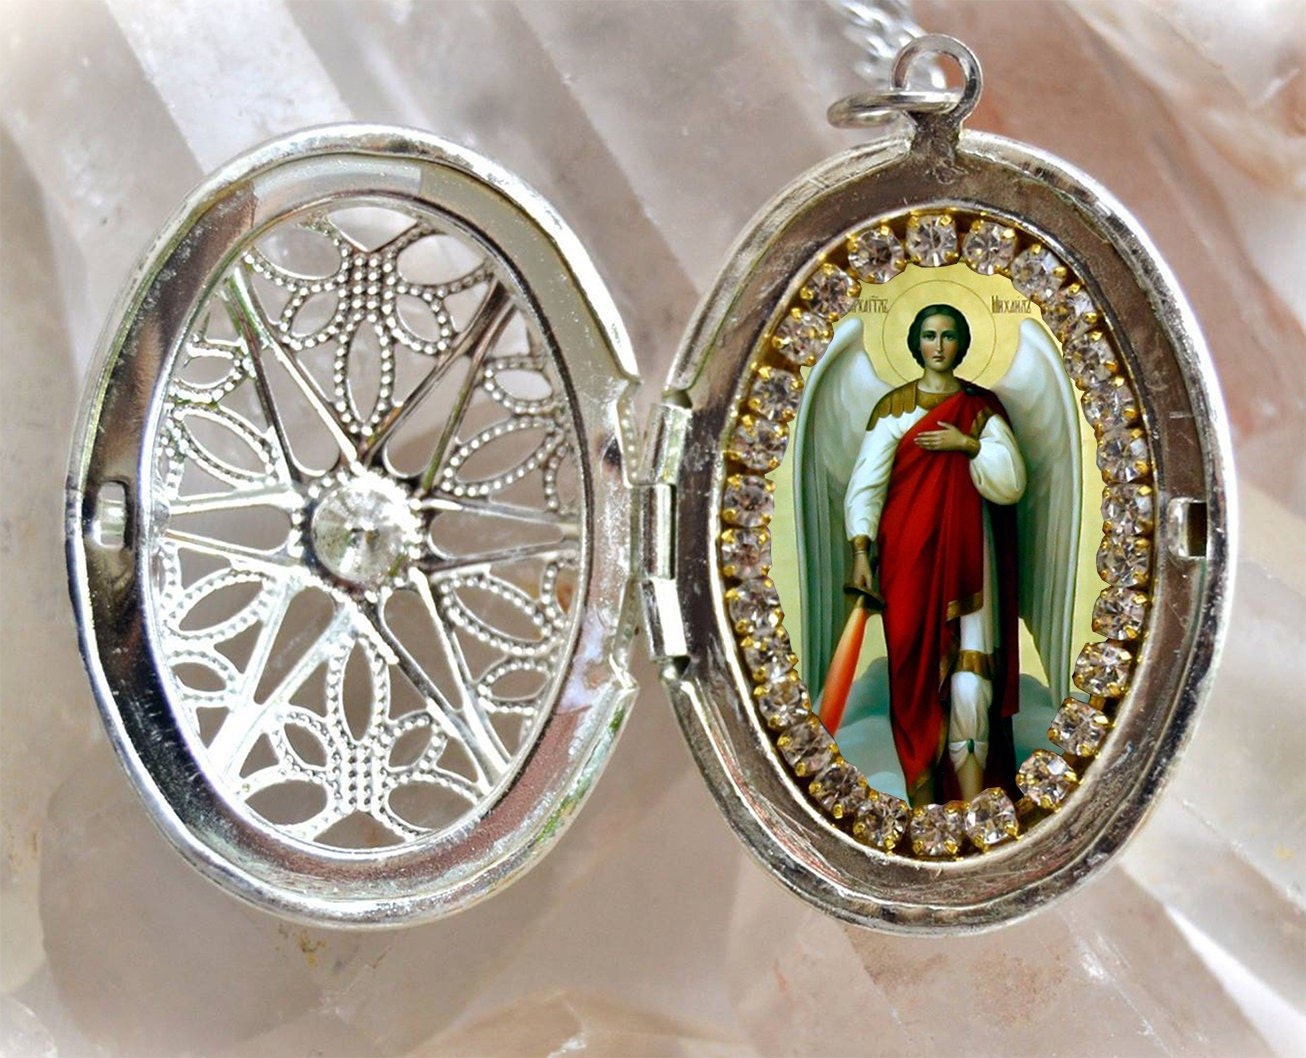 St michael archangel handmade locket necklace catholic christian st michael archangel handmade locket necklace catholic christian religious jewelry medal scapular pendant aloadofball Image collections